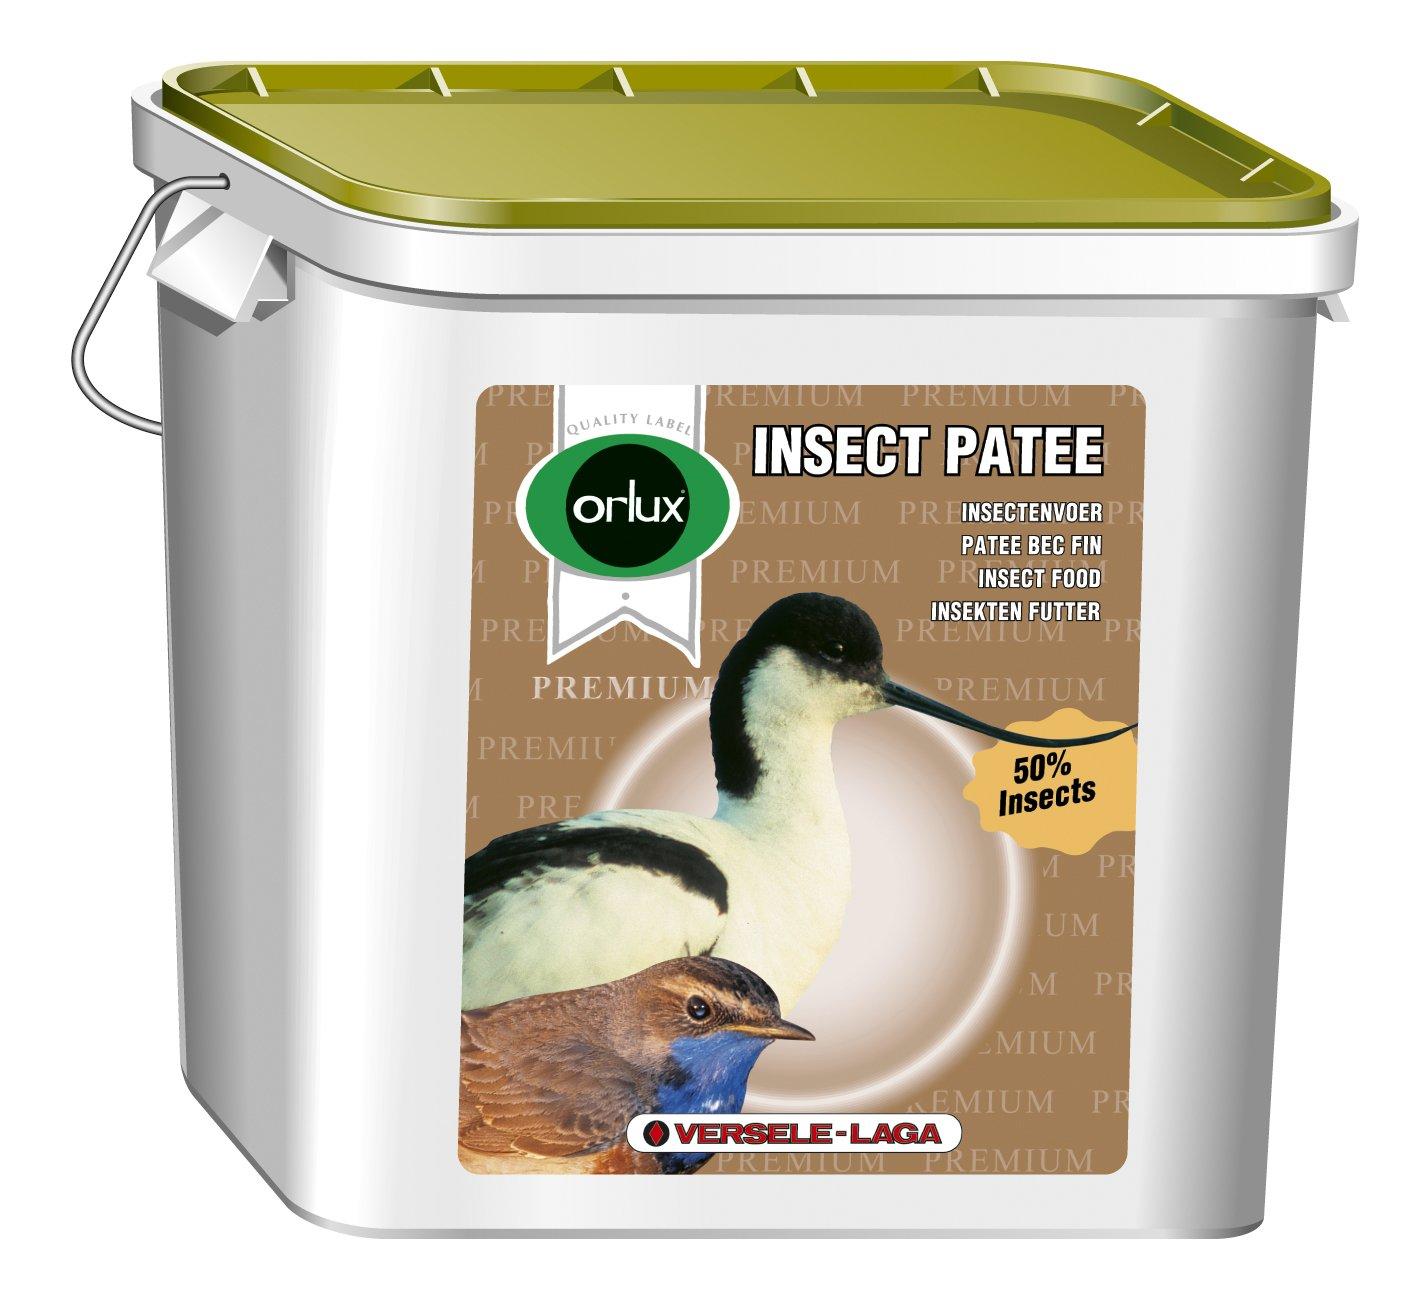 Orlux Insekt Patee Premium 10kg, 1er Pack (1 x 10 kg)